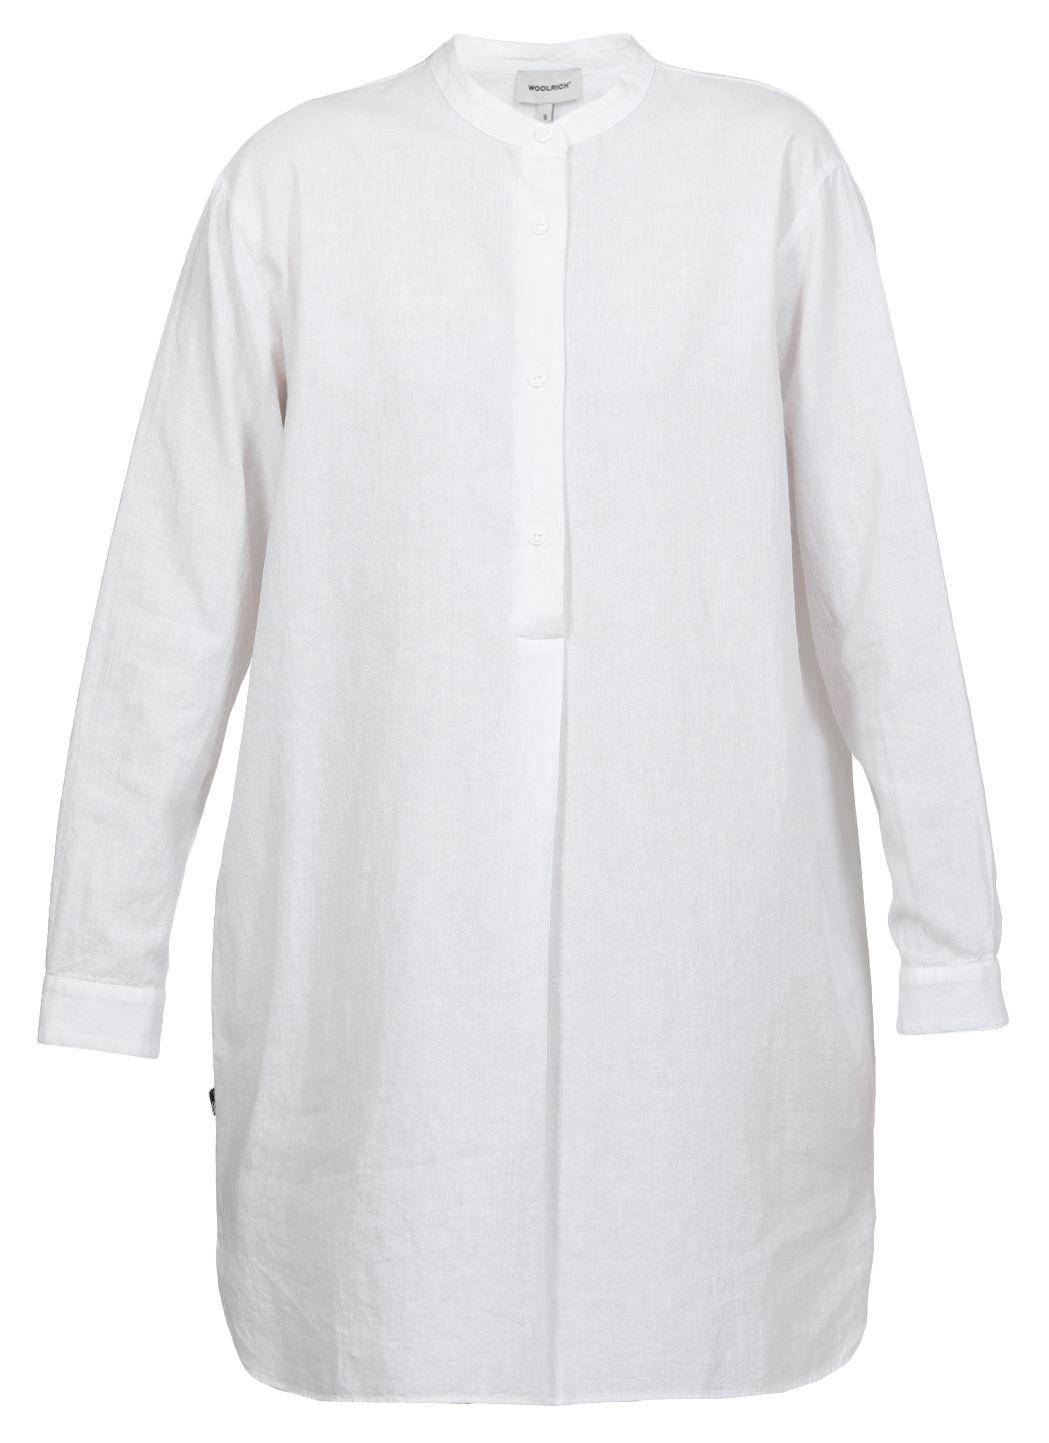 Linen and cotton oversize shirt